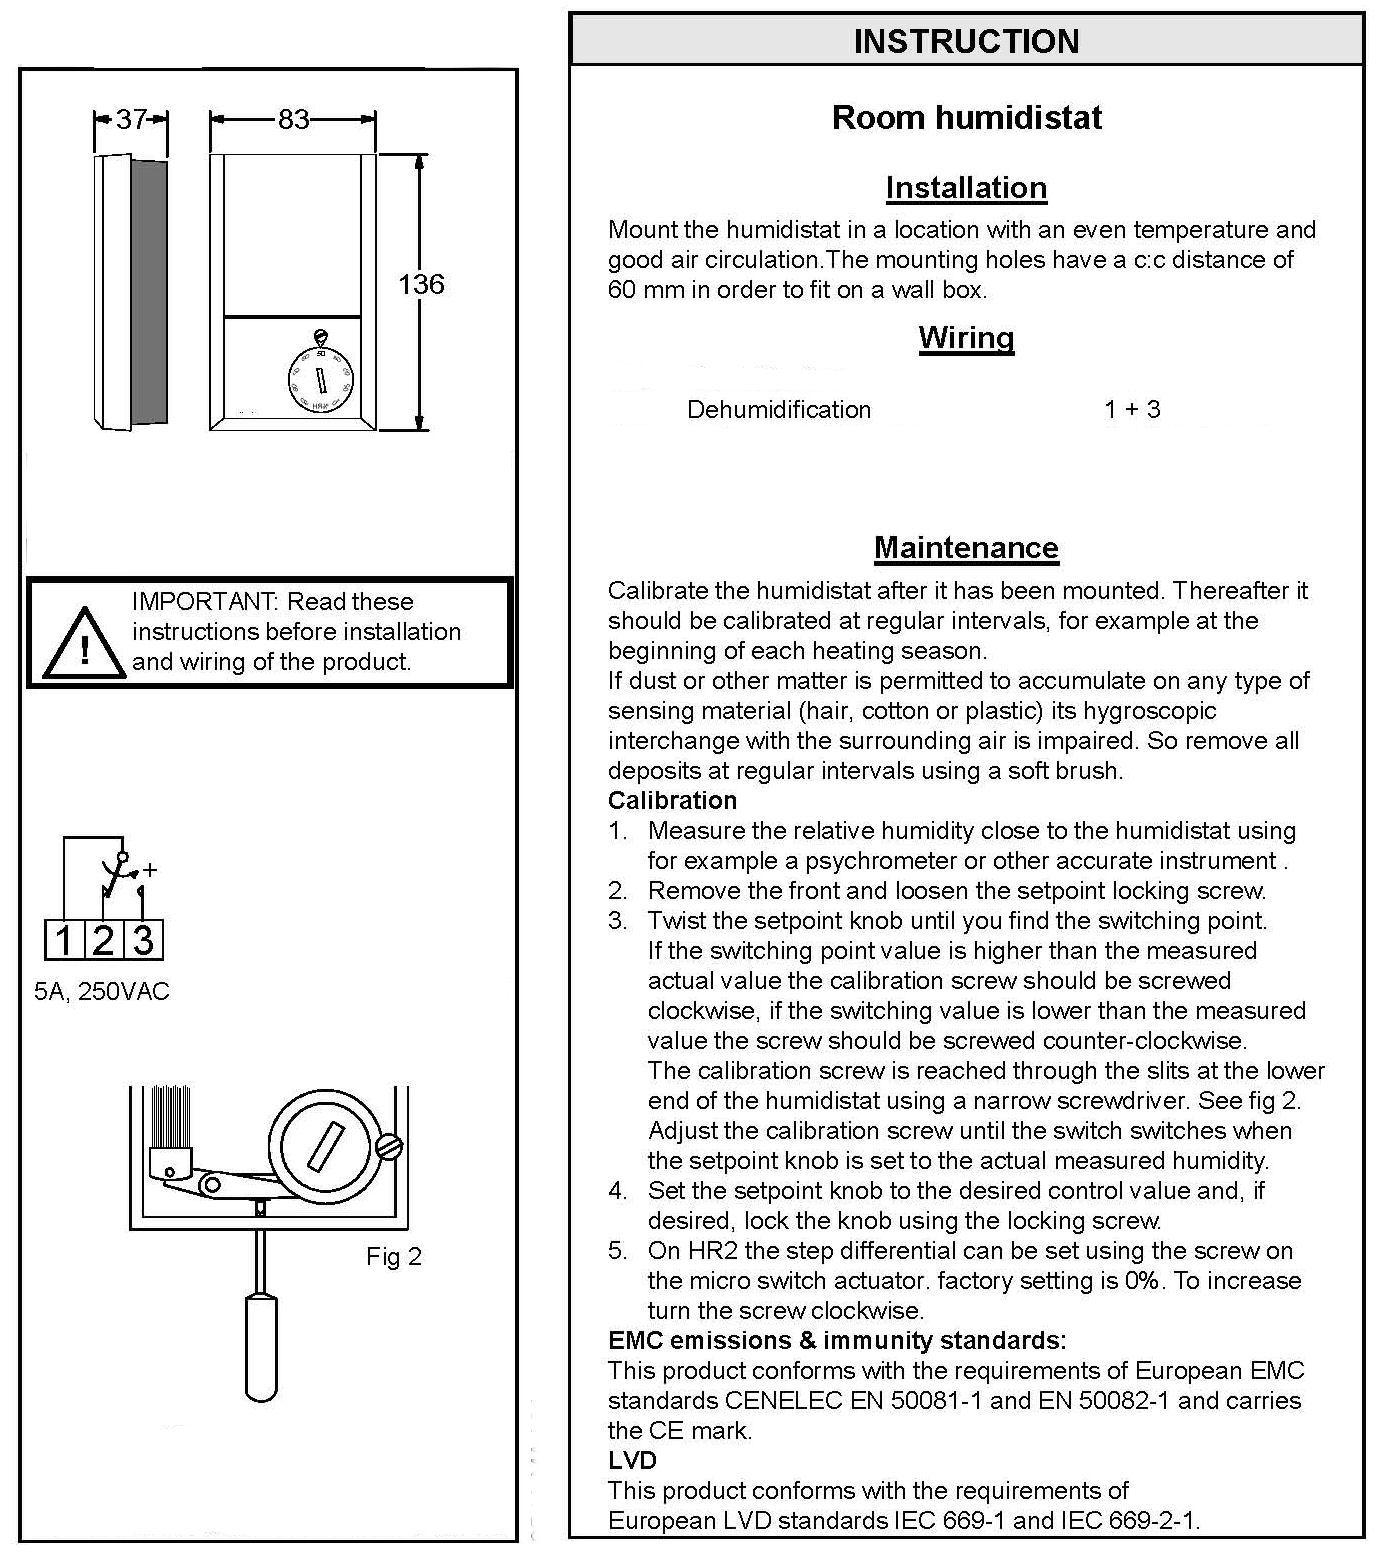 Dsr20 Industrial Dehumidifier 190l Ecor Pro Wiring Diagram User Manual Symbol